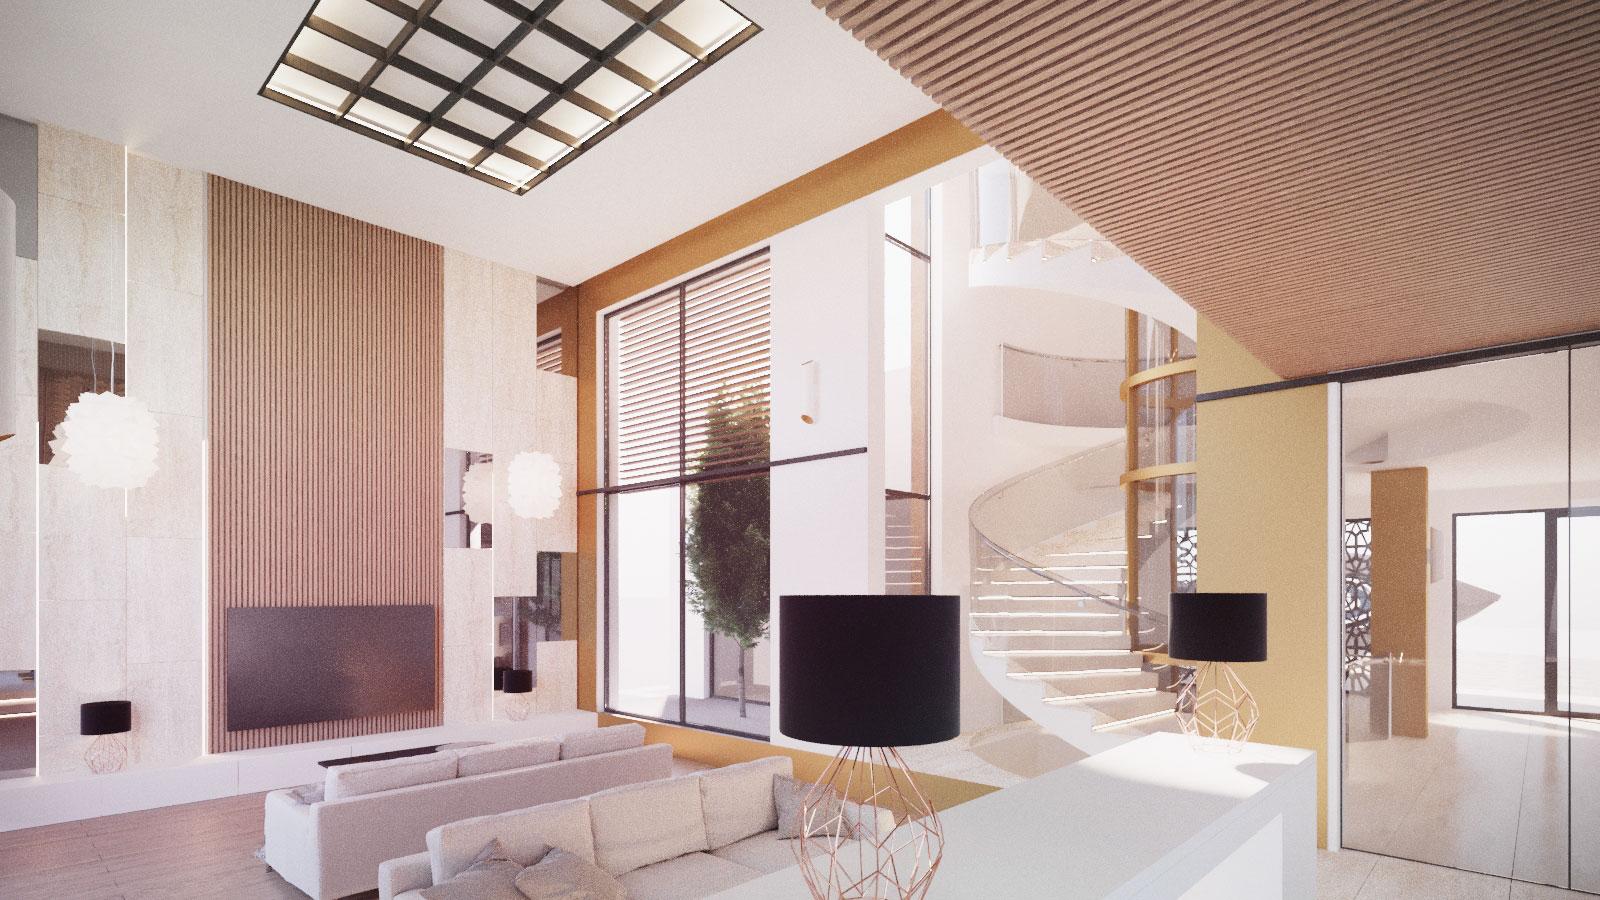 https://nbc-arhitect.ro/wp-content/uploads/2020/10/NBC-Arhitect-_-residences-_-Mogo-Villa-_-Romania-_-interior-view_16.jpg